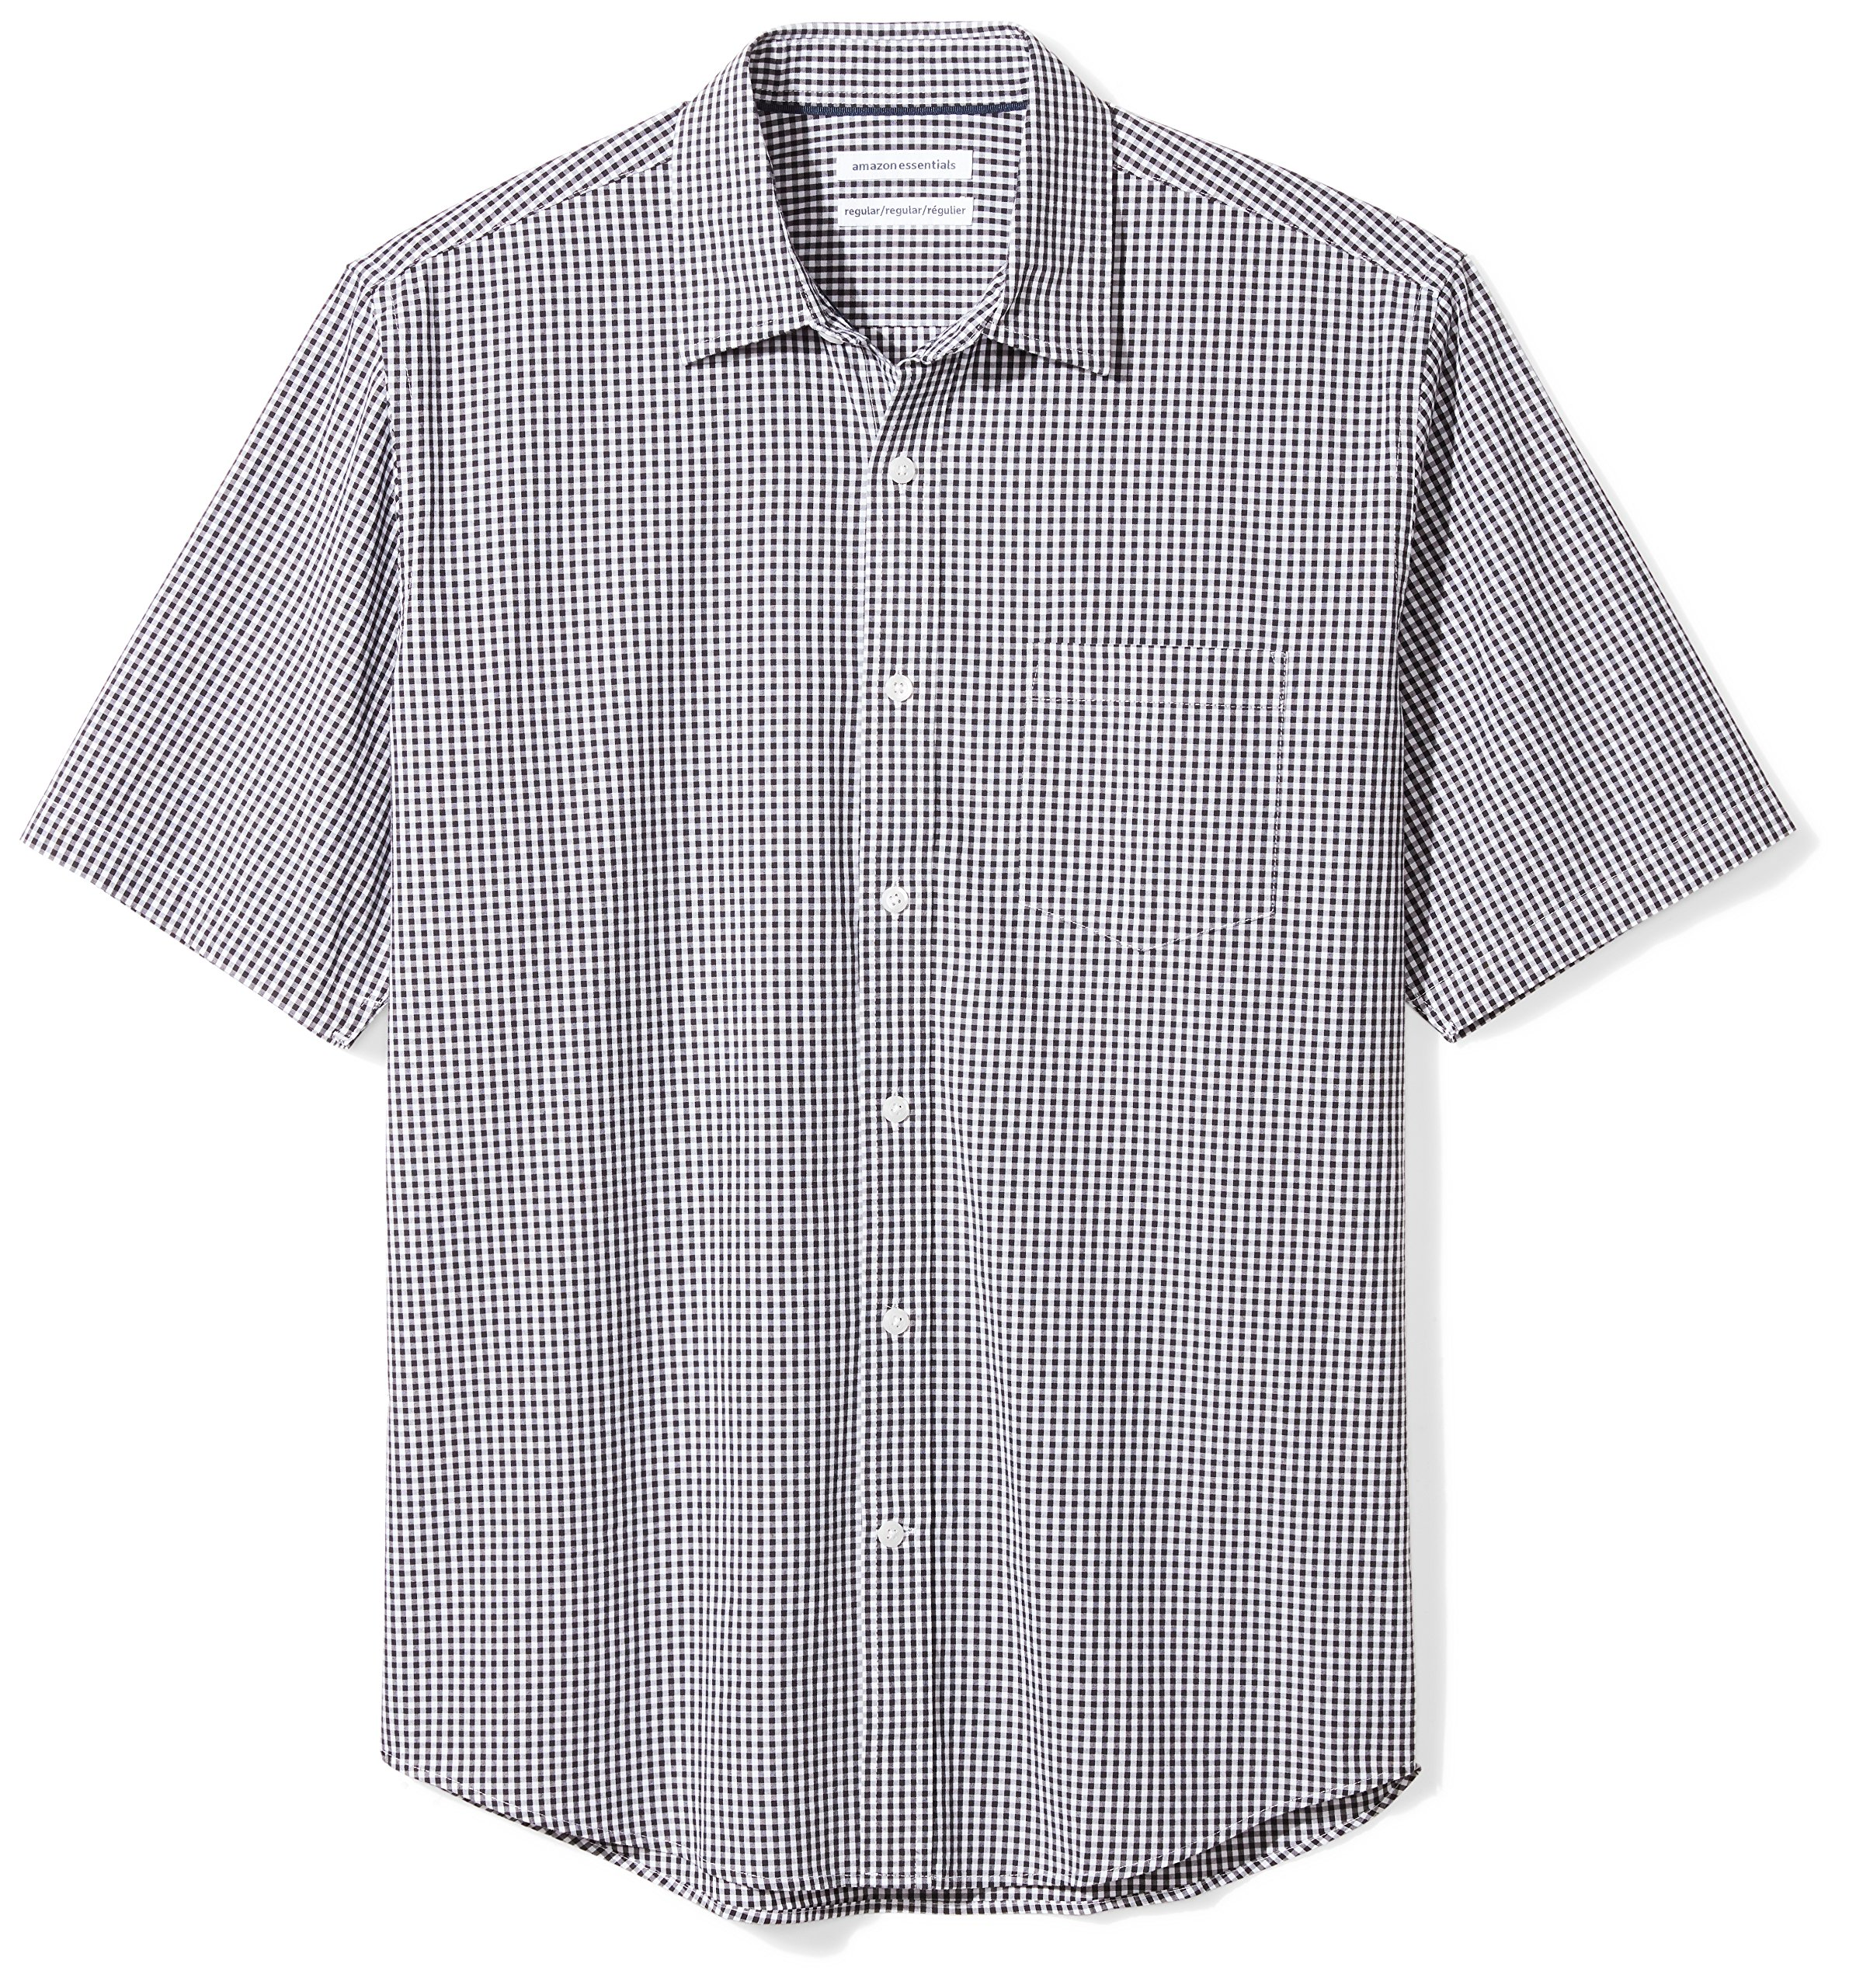 Amazon Essentials Men's Regular-Fit Short-Sleeve Casual Poplin Shirt, black gingham, X-Large